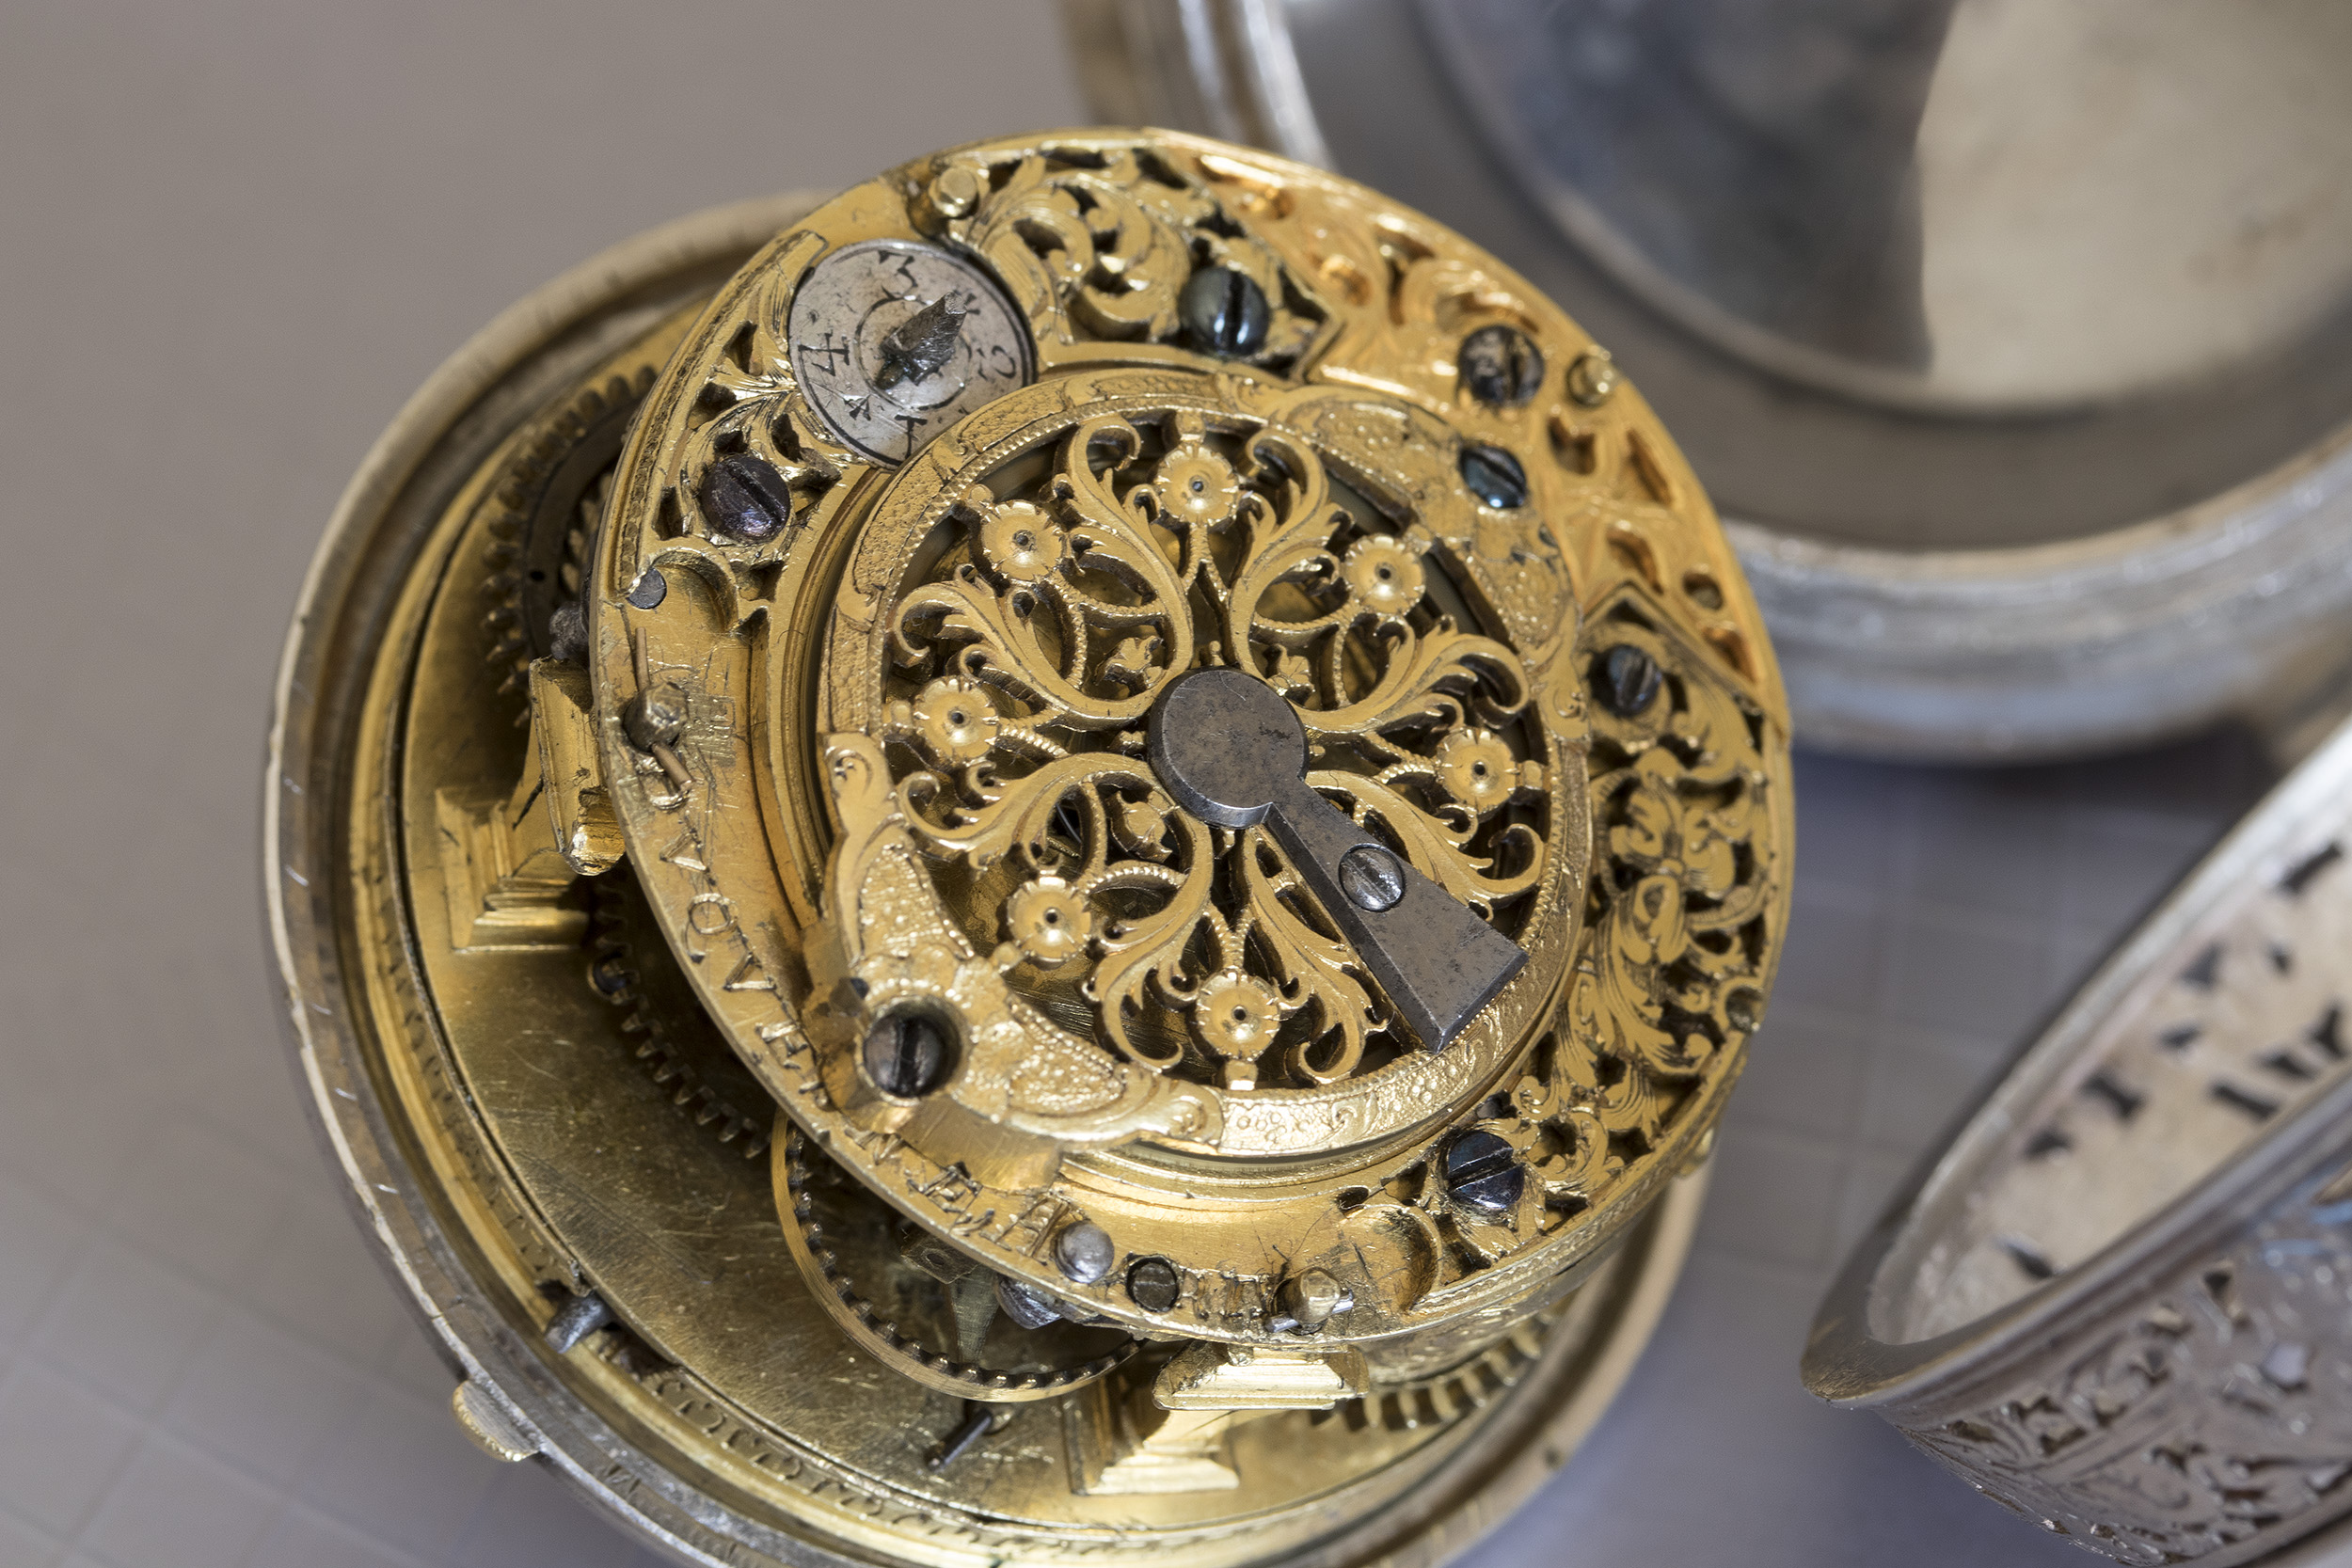 Un oignon alarme de 1700 signé Duquesne à Paris 47642281762_40a49e5c13_o